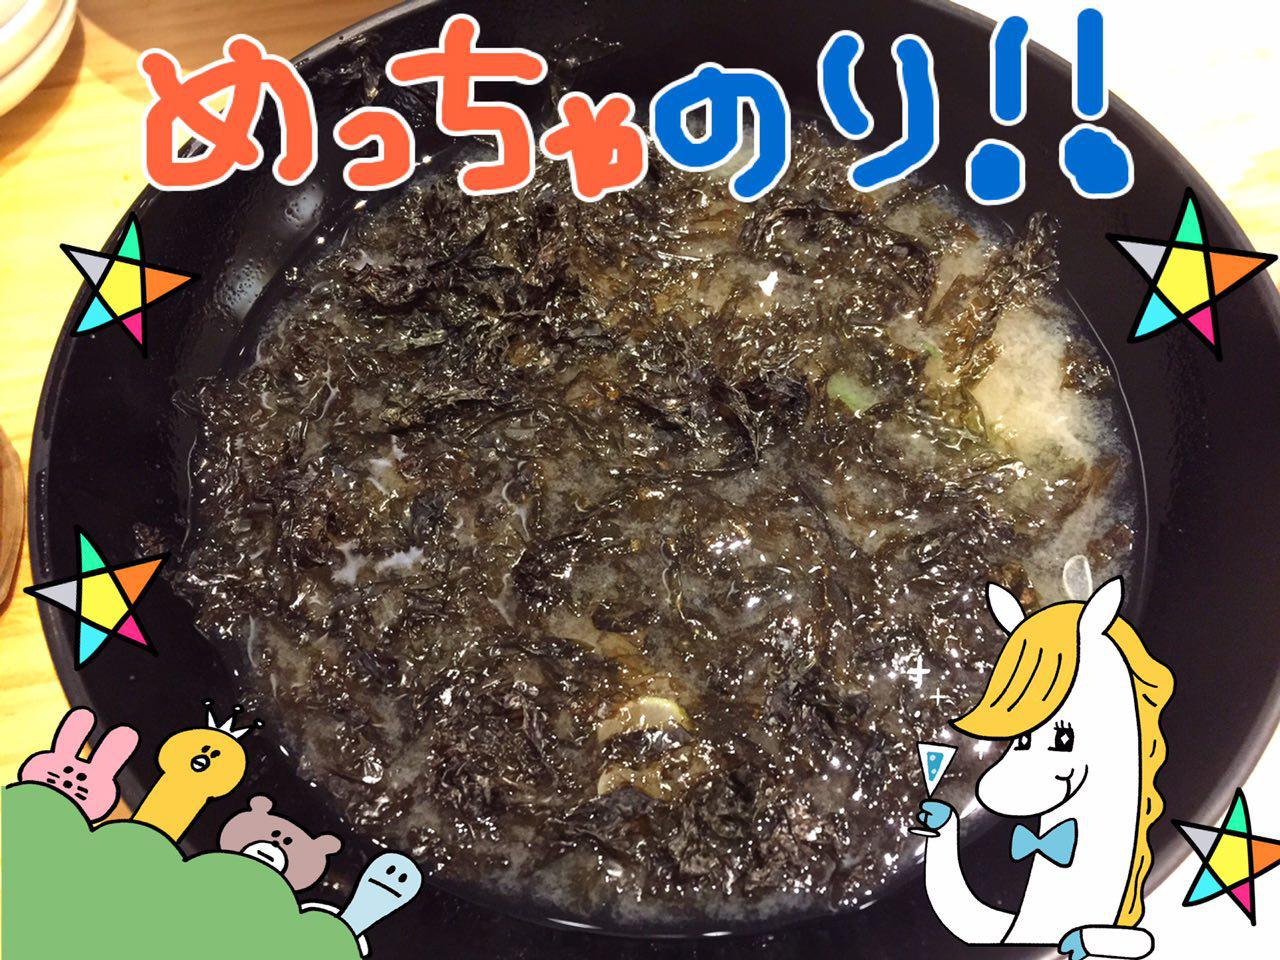 photo_2017-02-12_22-16-18.jpg